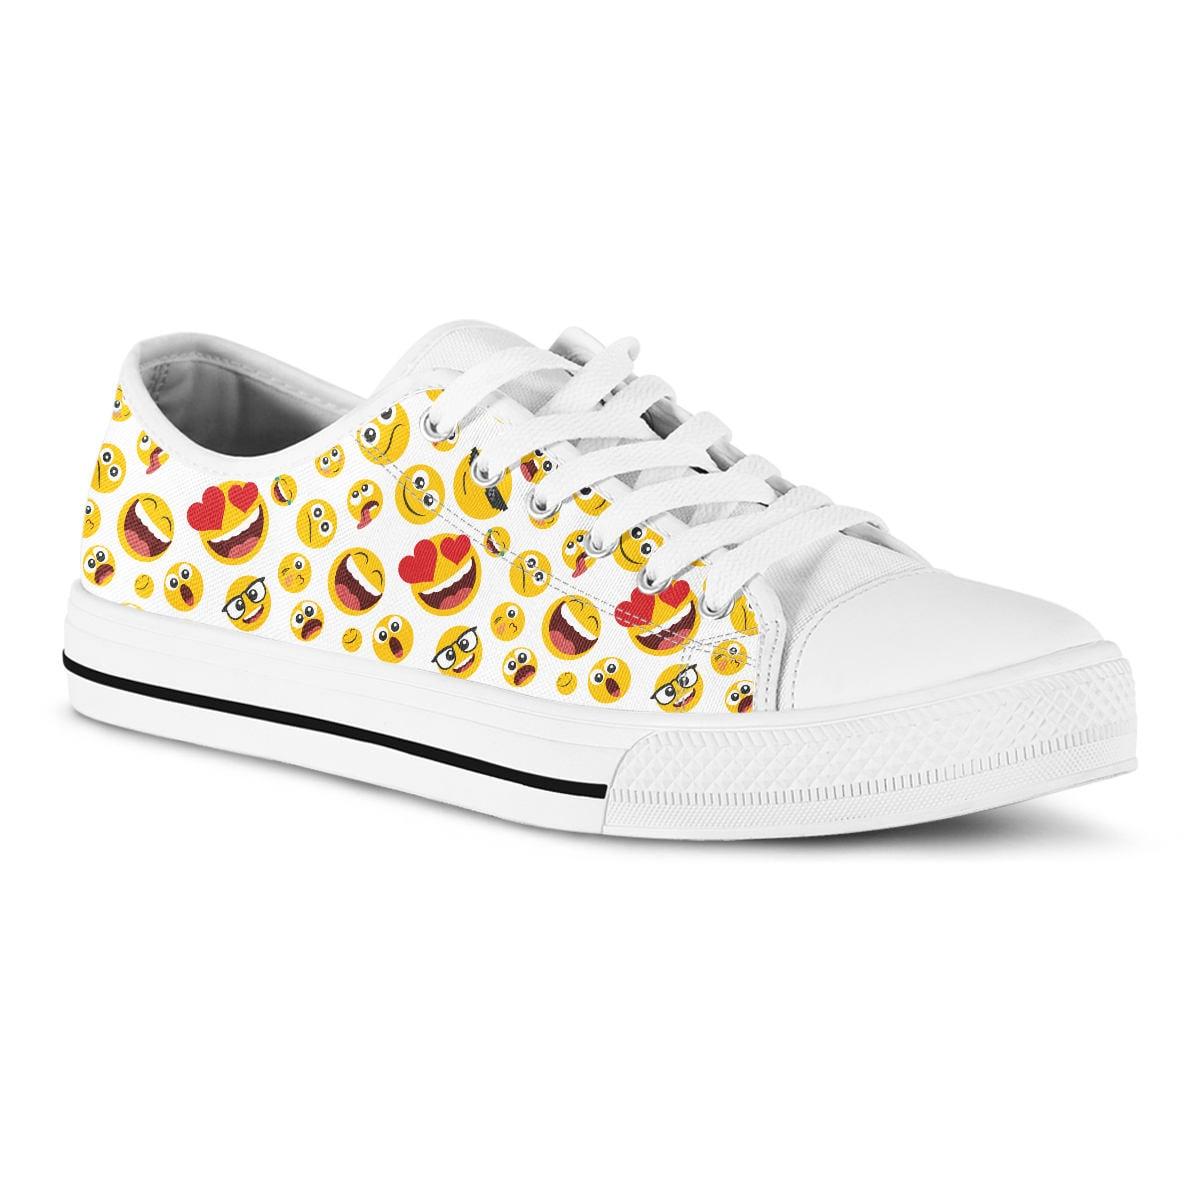 chaussures baskets Emoji Emoji chaussures de Tennis personnalisé xzpxw0vqU